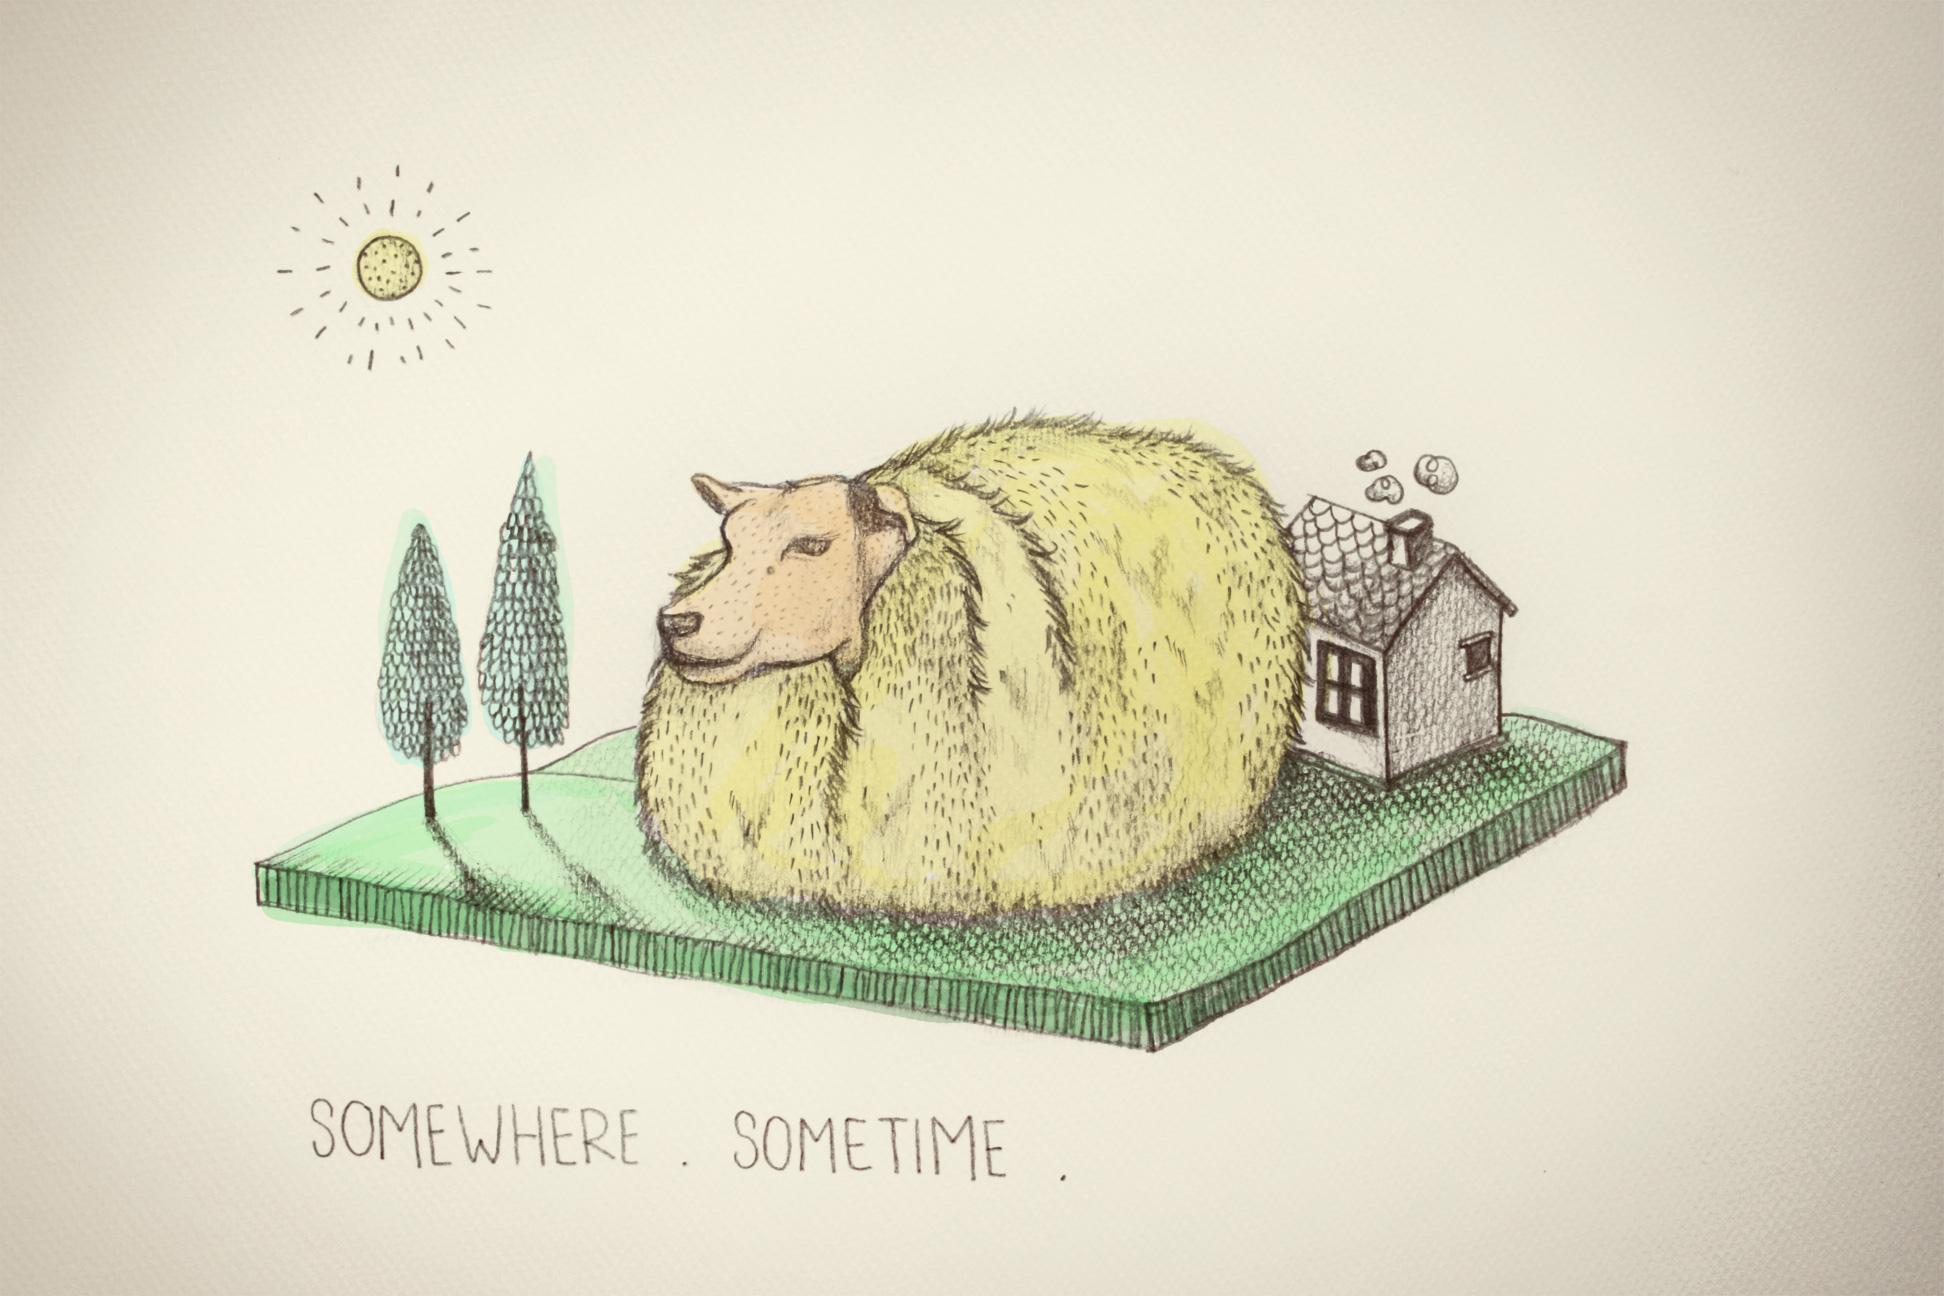 Let's go somewhere sometime!